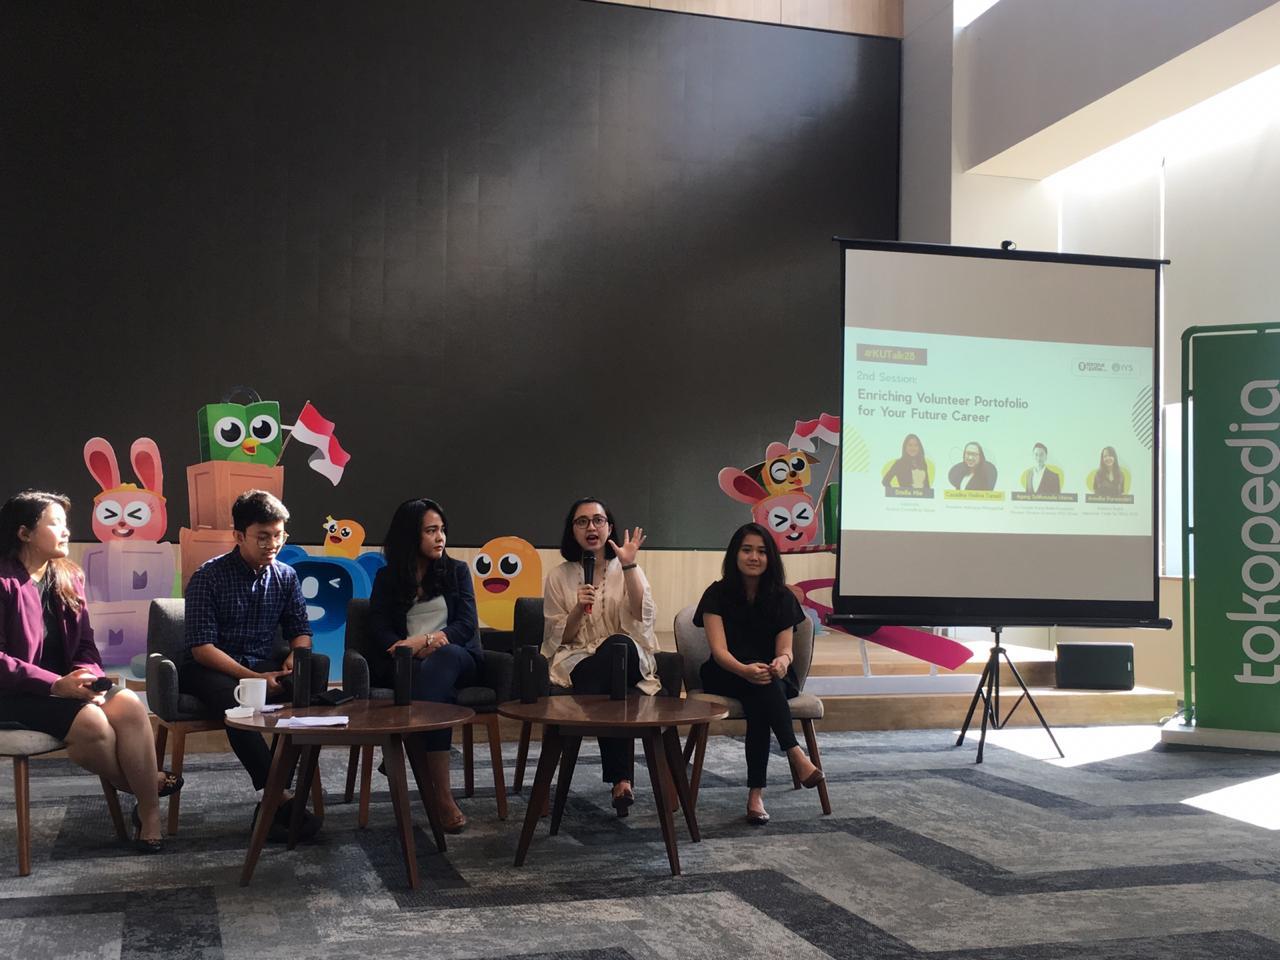 "On 16 November 2019, Indonesia Mengglobal was speaking at #KUTalk28 on ""Enriching Volunteer Portfolio for Your Future Career"""